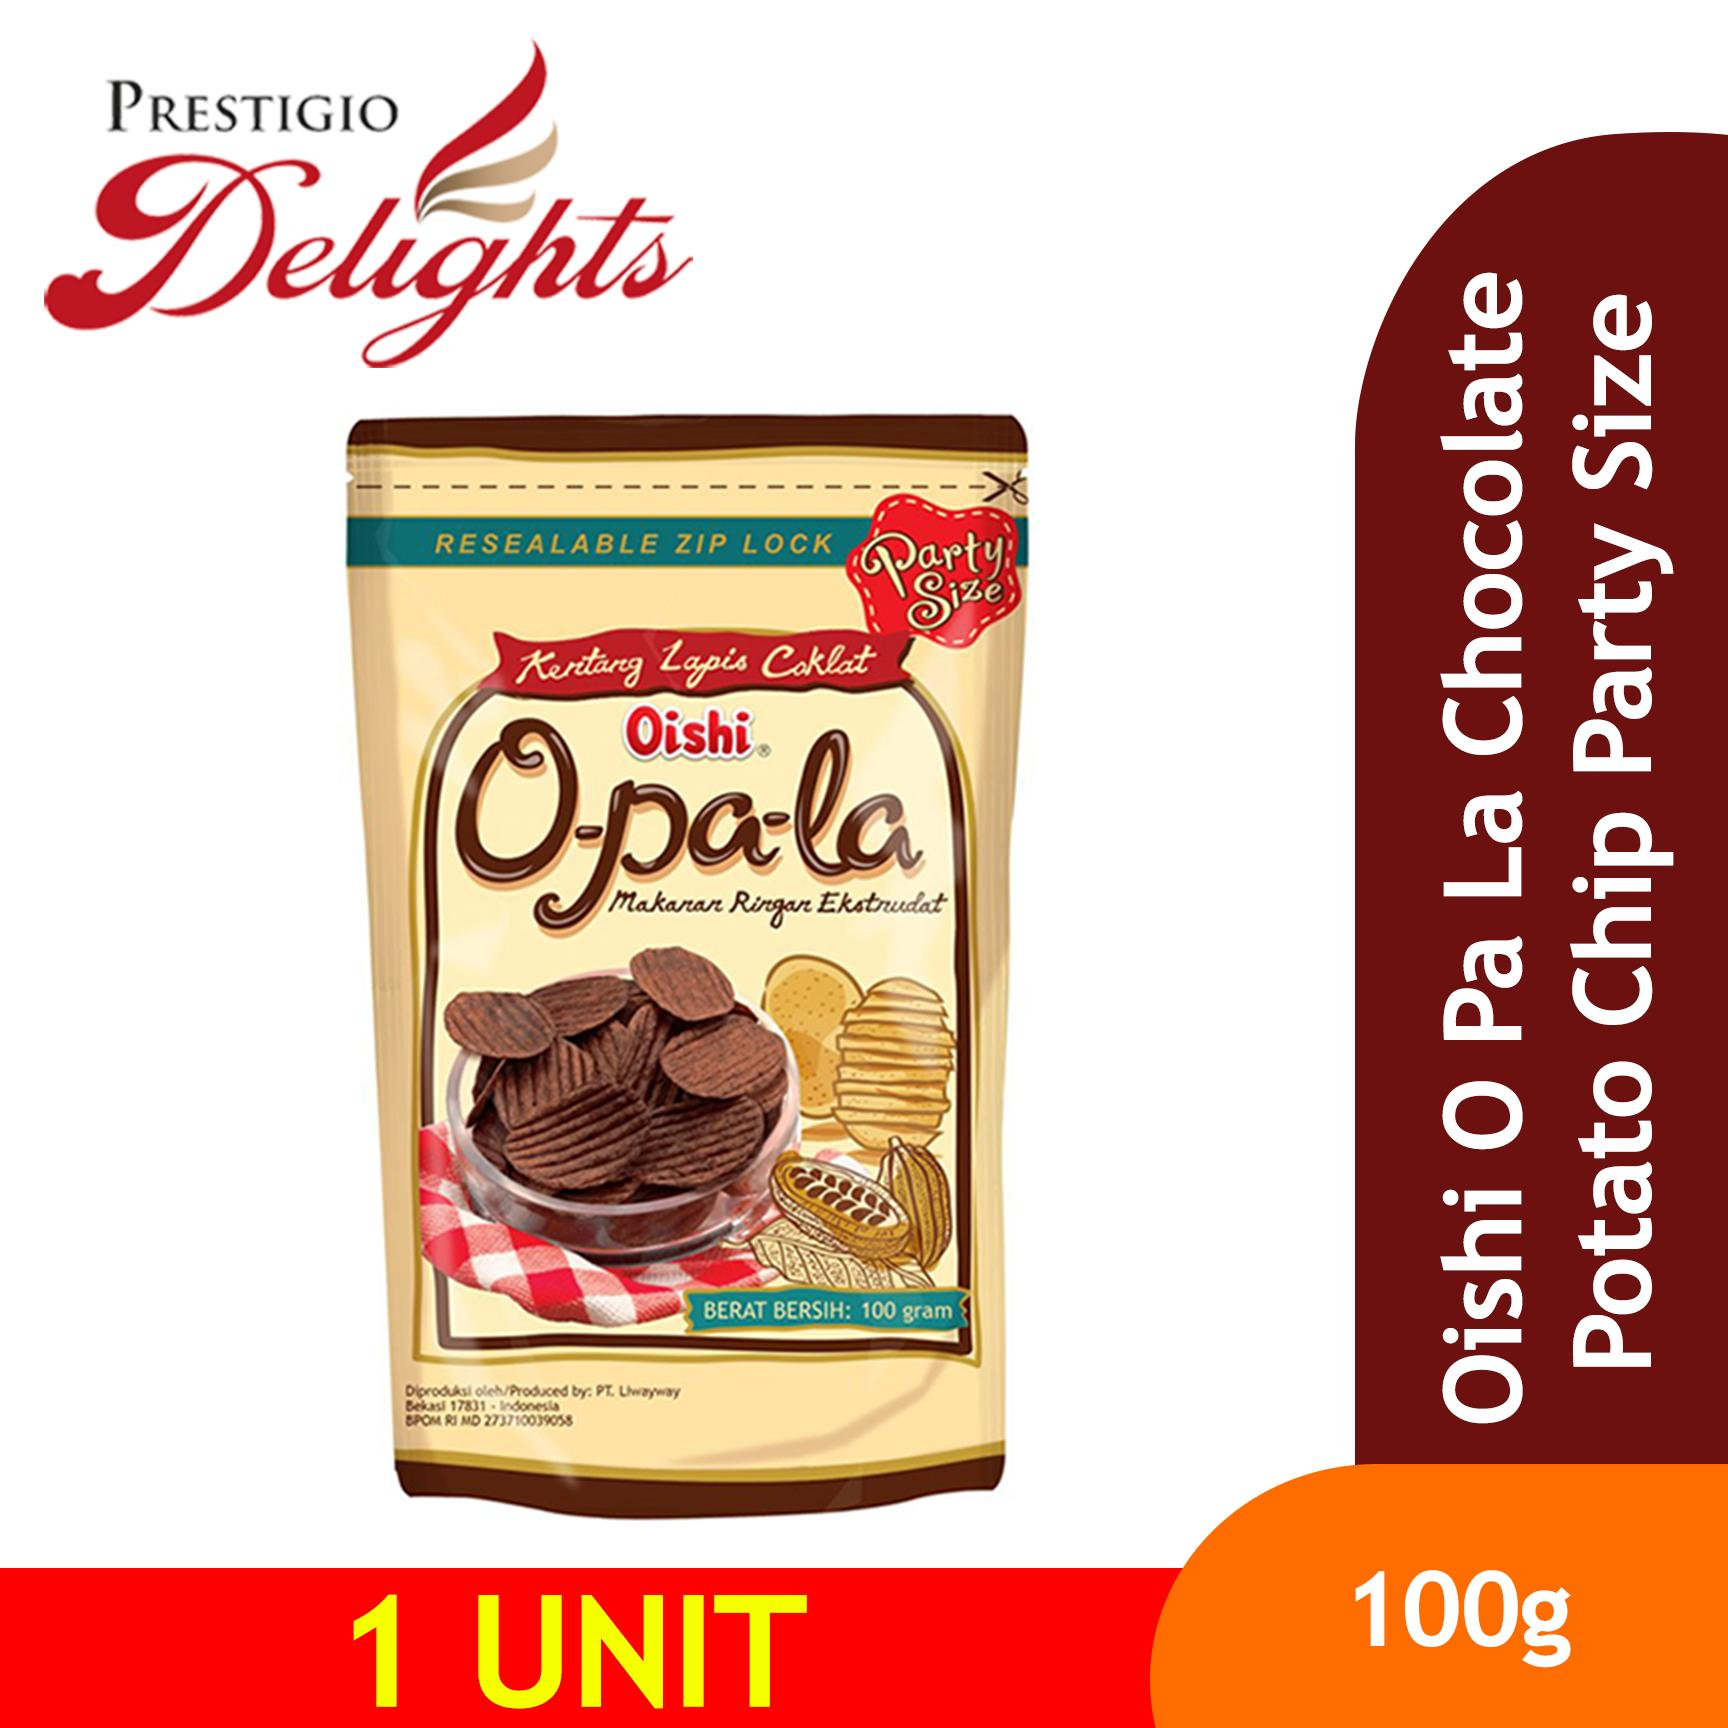 Oishi O Pa La Chocolate Potato Chip Party Size 100g By Prestigio Delights.